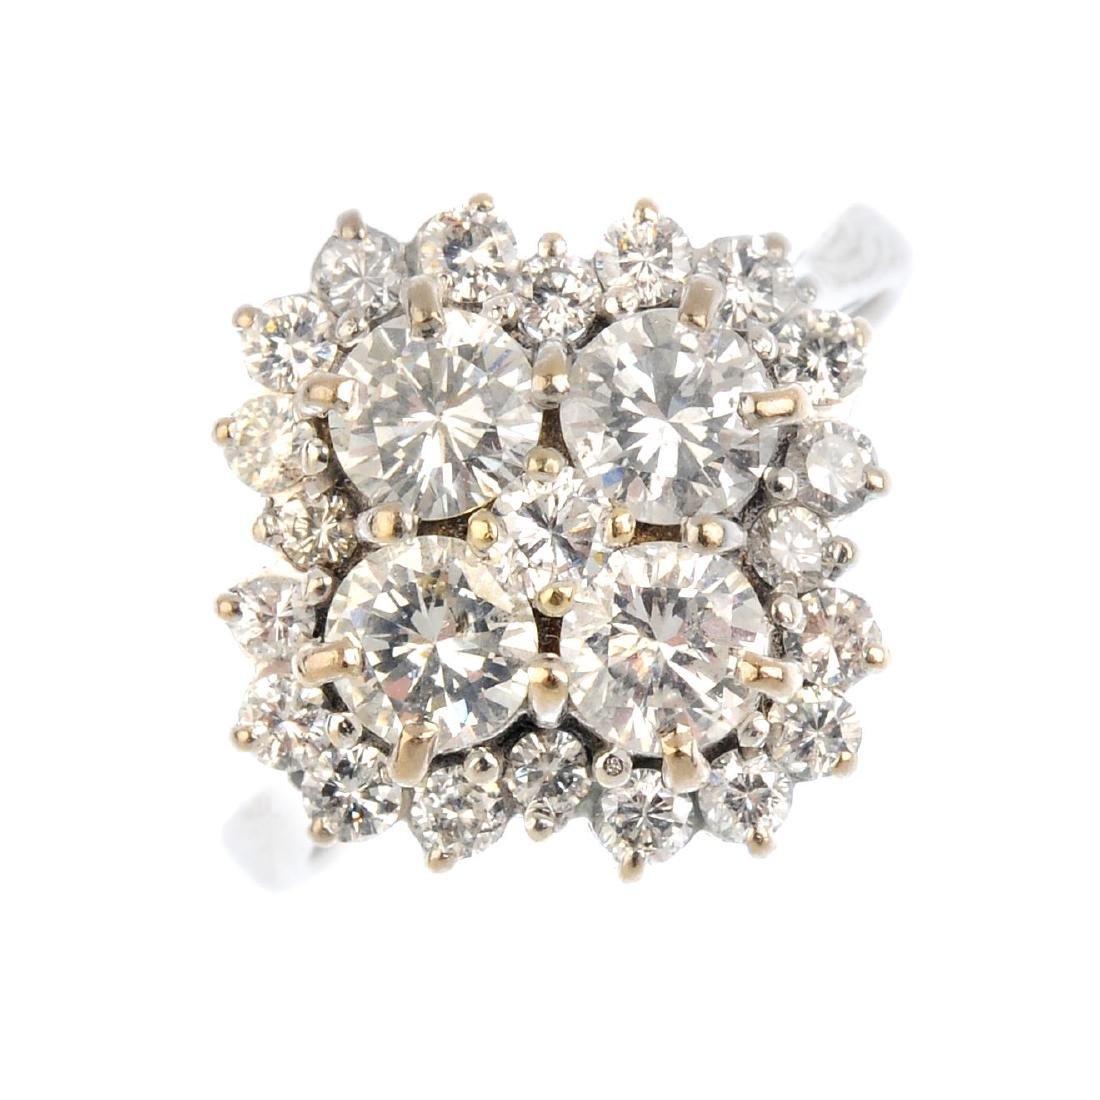 A diamond cluster ring. The brilliant-cut diamond